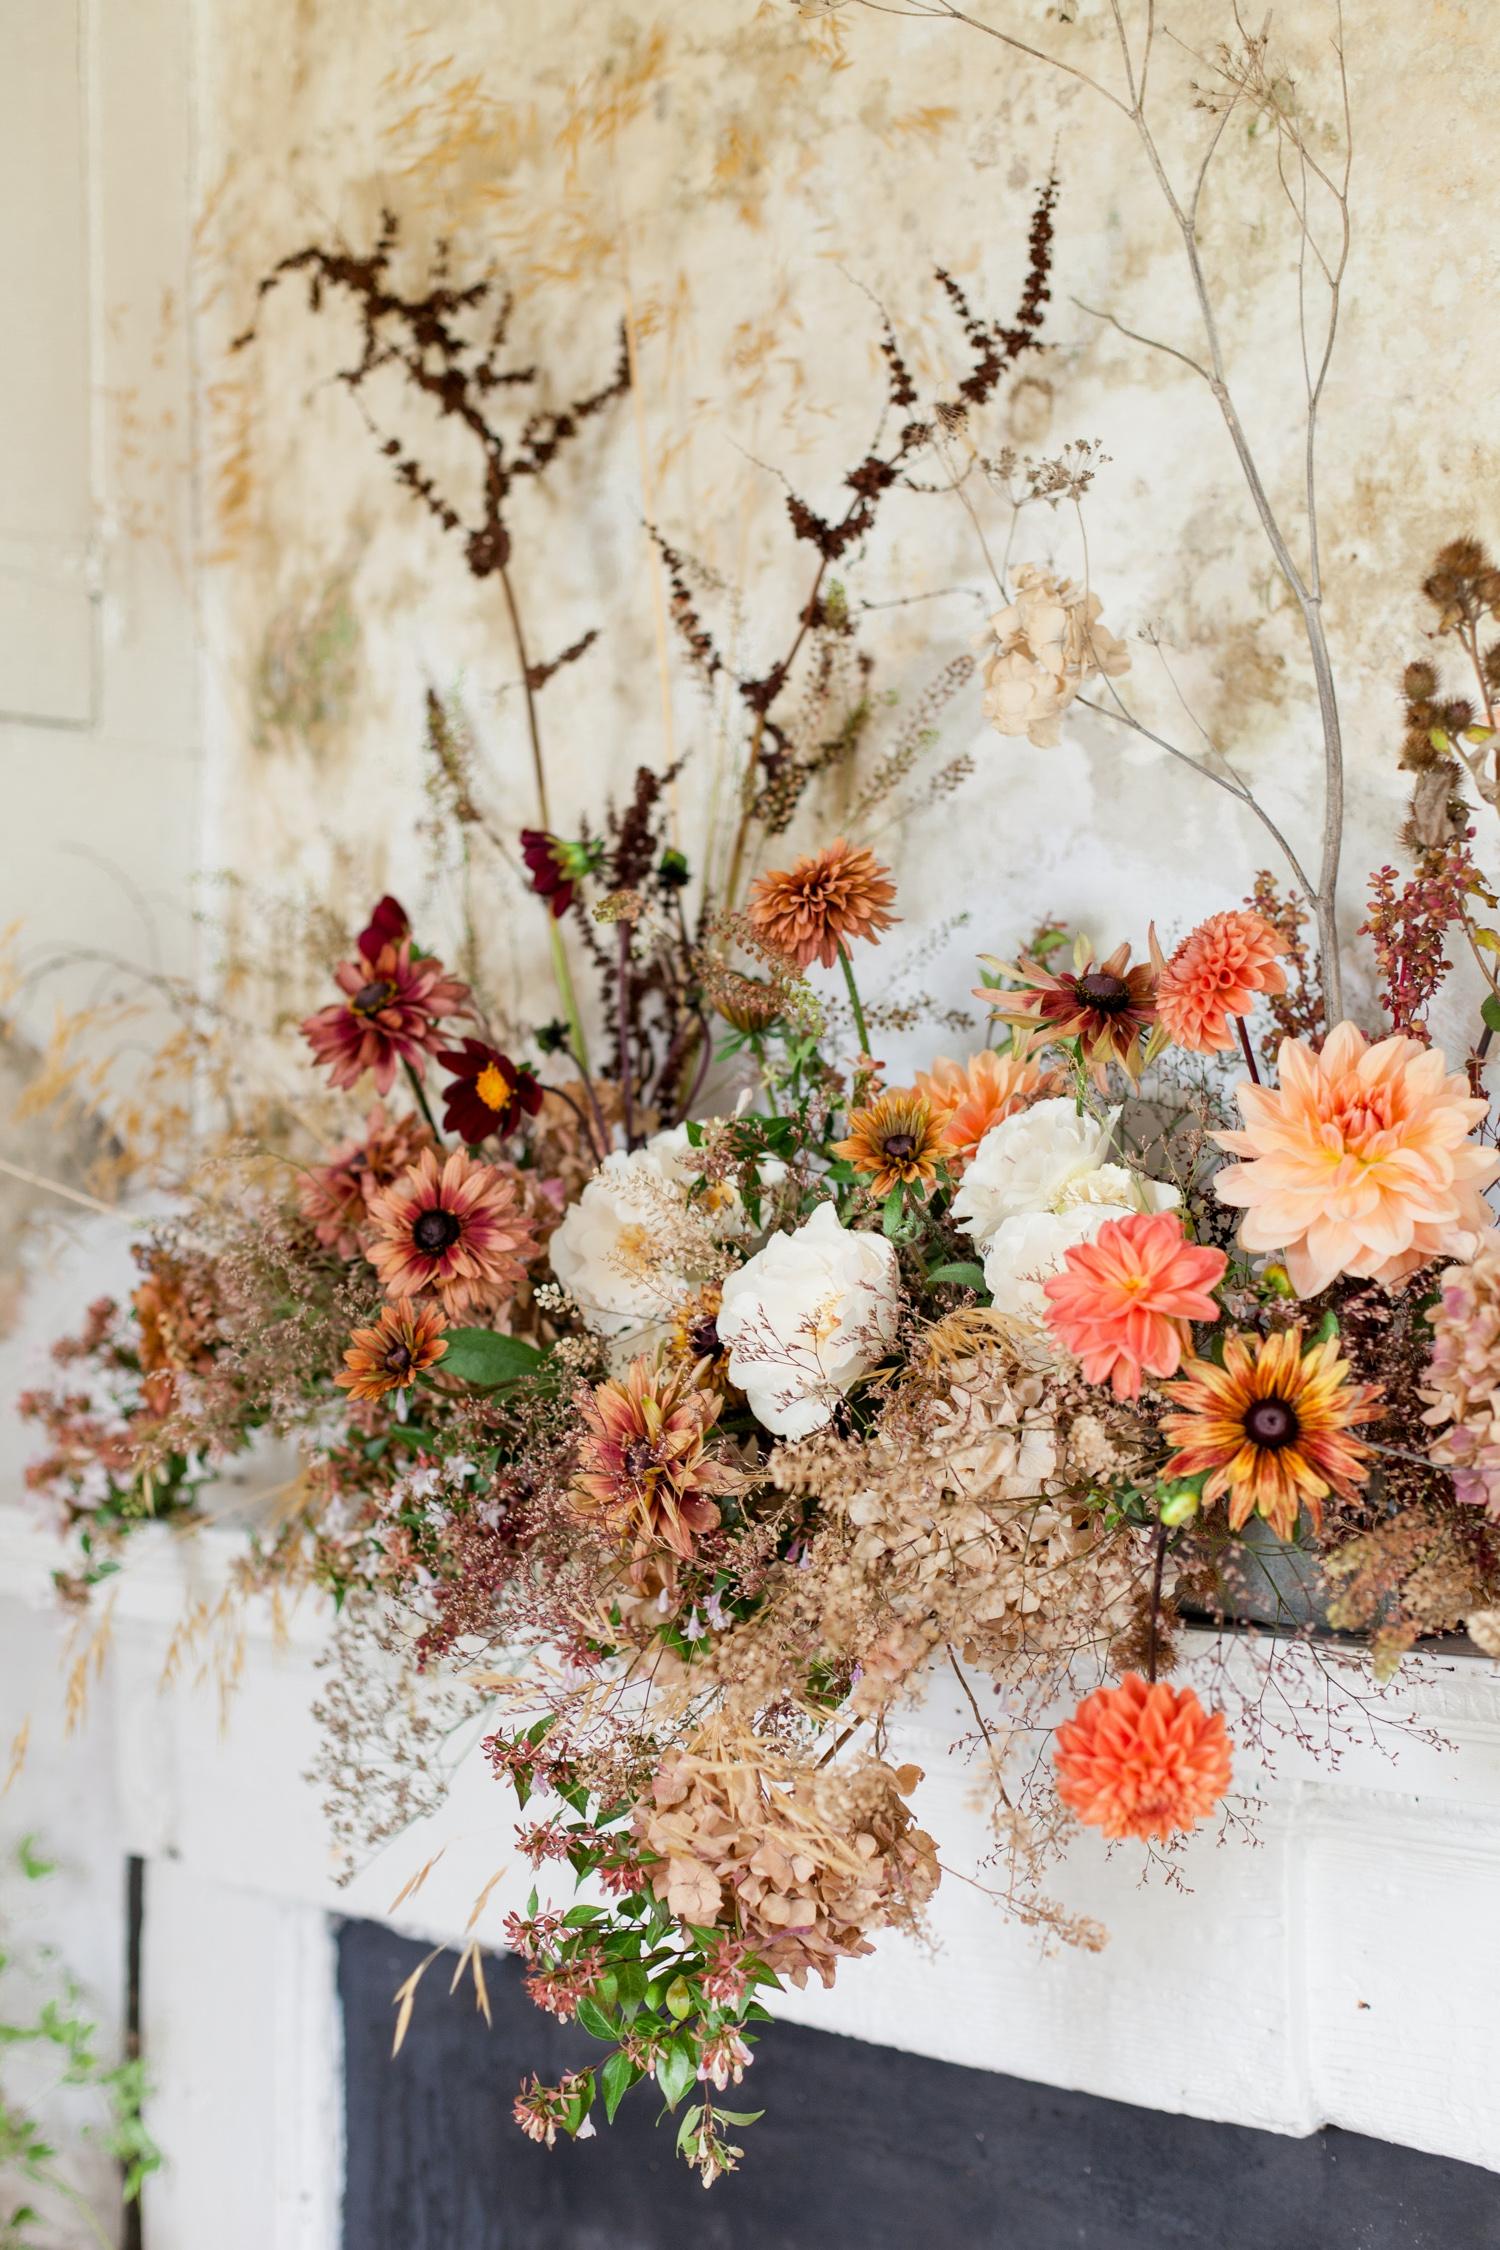 Wild and Romantic Wedding Flowers, an Autumnal mantlepiece arrangement